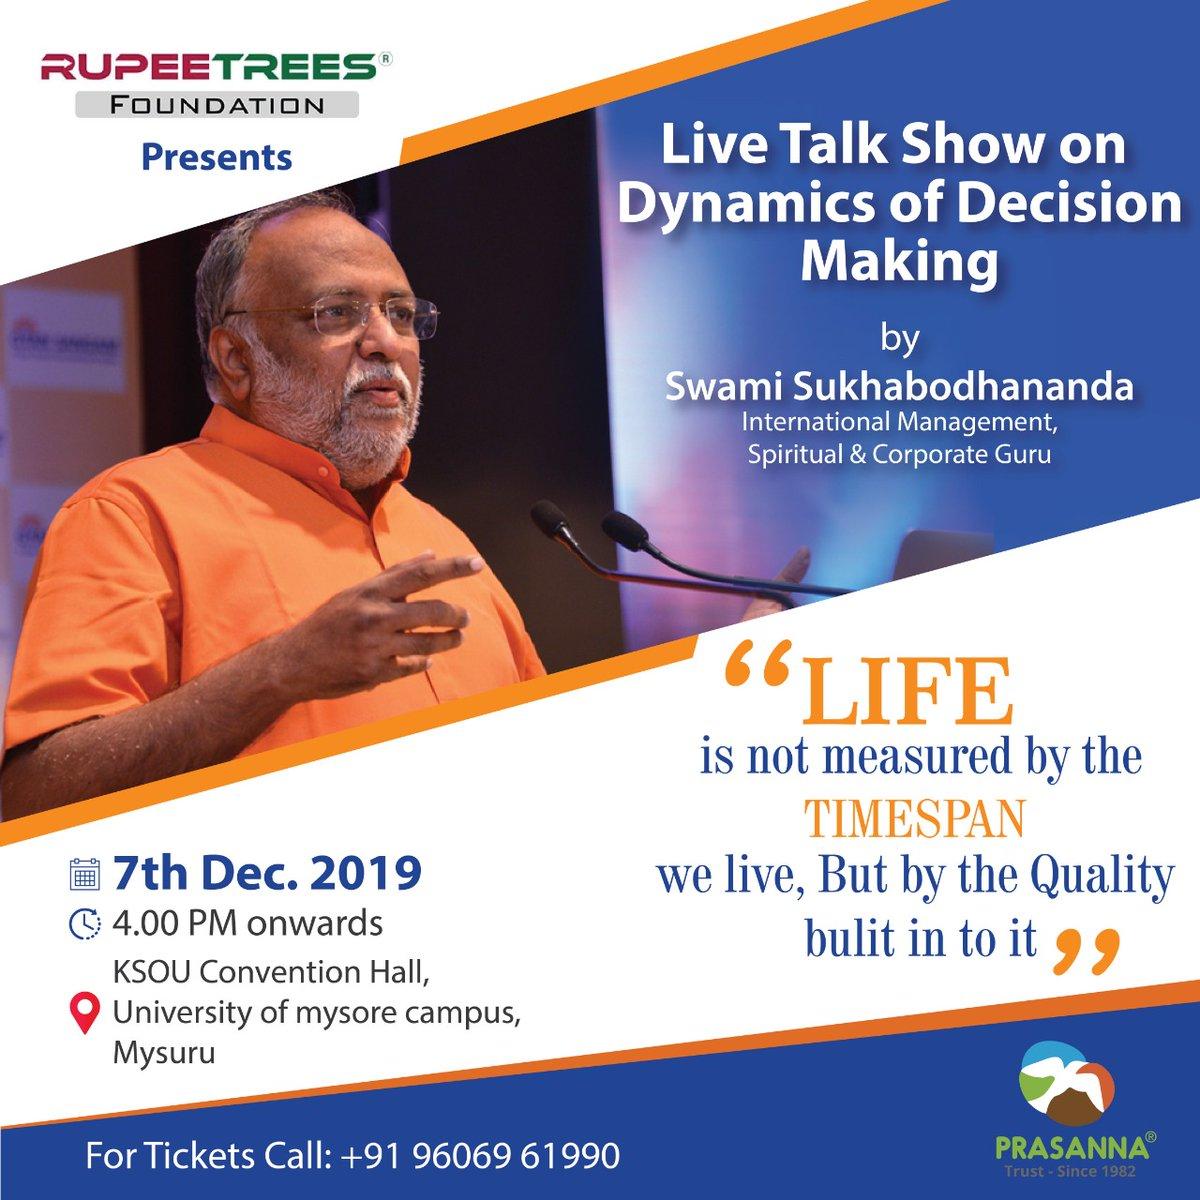 #eventsinmysore #RupeetreesFoundation #swamisukhabodhananda #prasannatrust #mysoreevents #live #dynamics #decisionmakingpic.twitter.com/l3xAKTDMsg